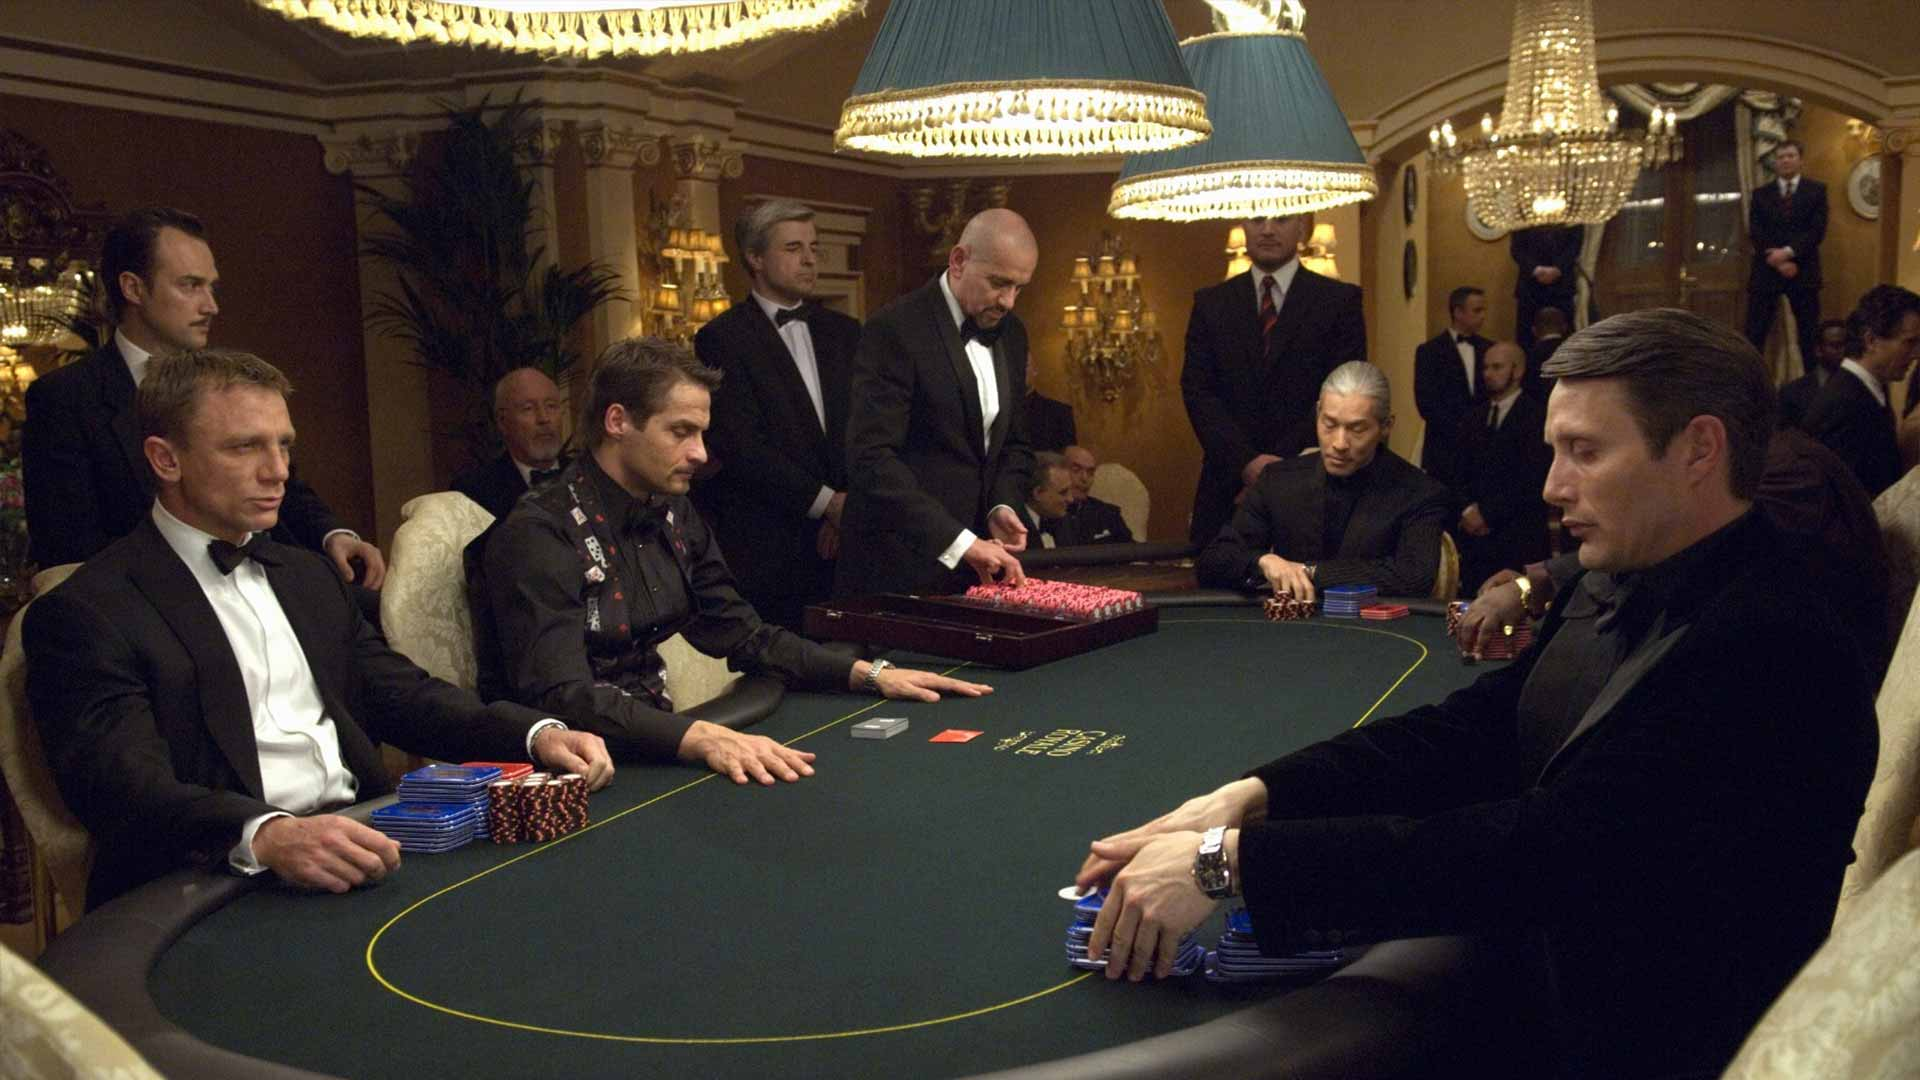 Royal Jackpot-Free Slot Casino - For PC (Windows 7 8 10 XP) Free Download